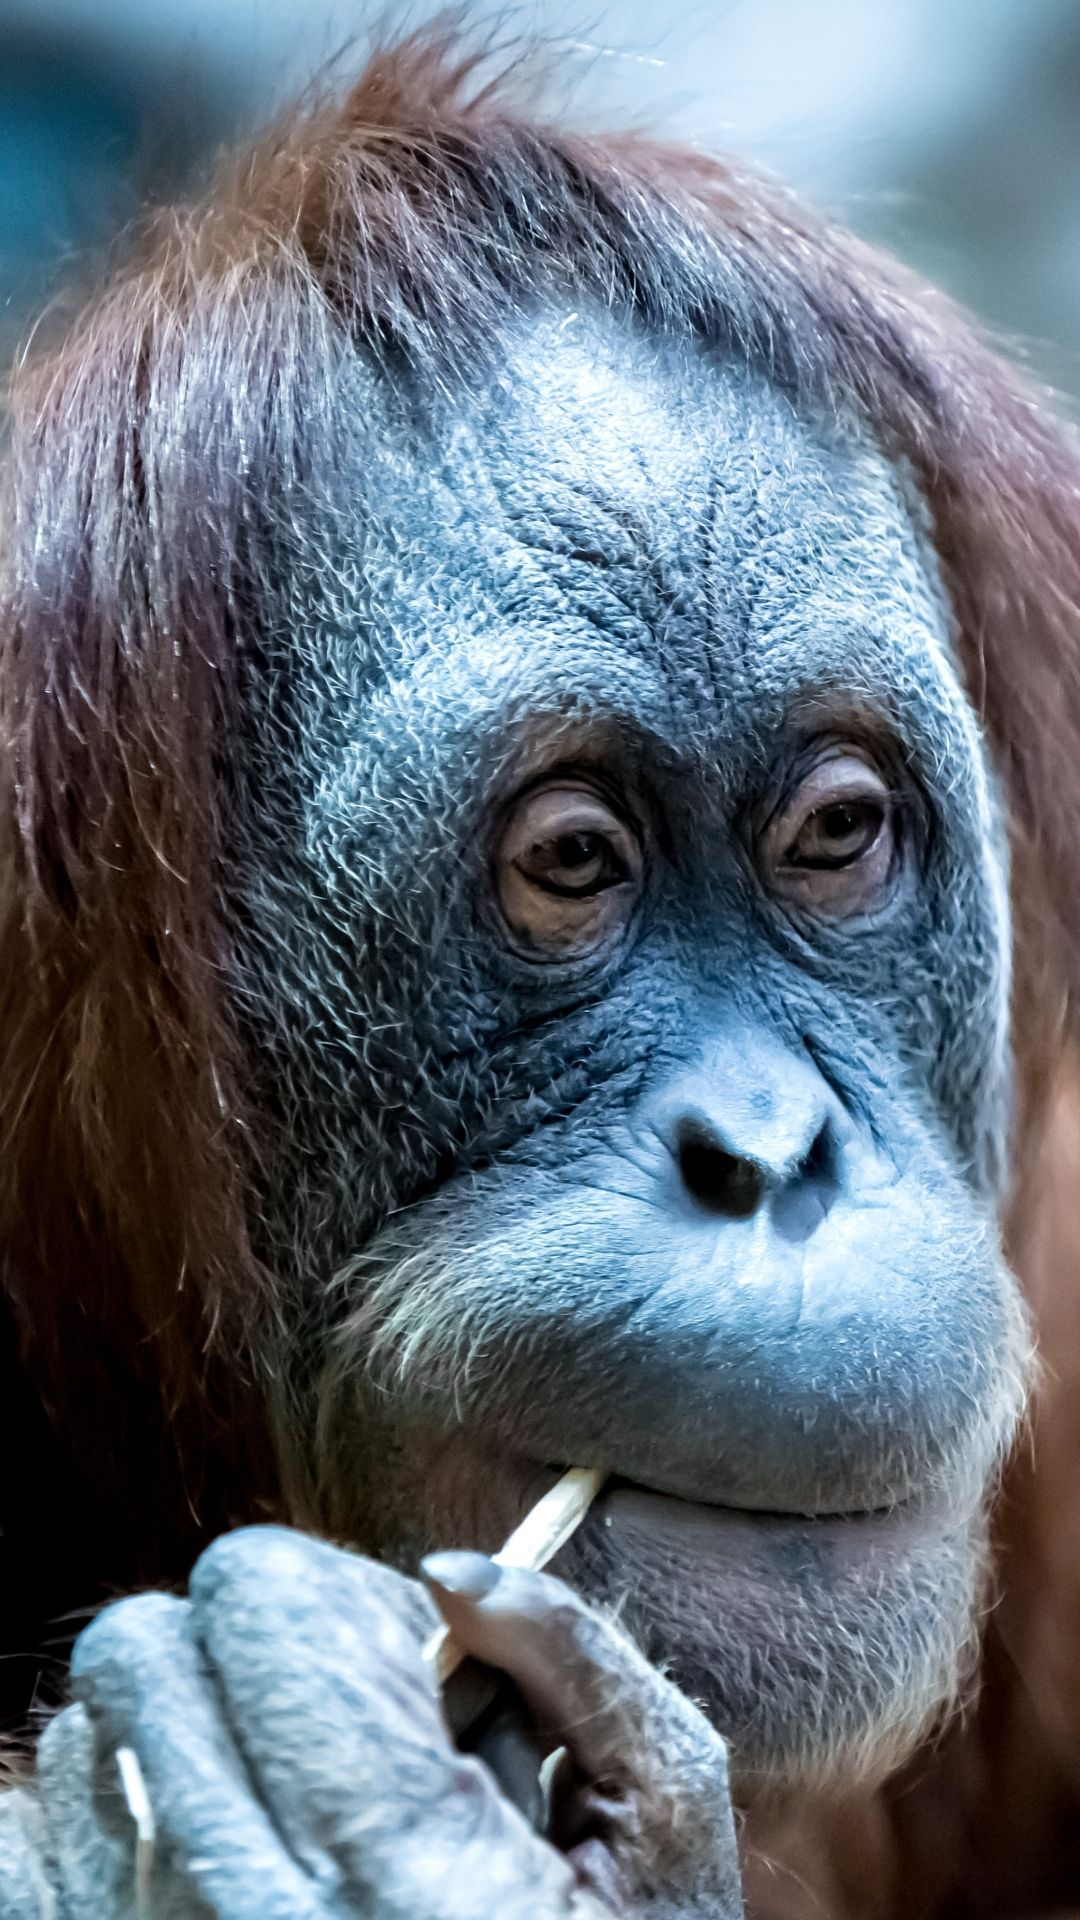 Photos Of Monkeys Funny